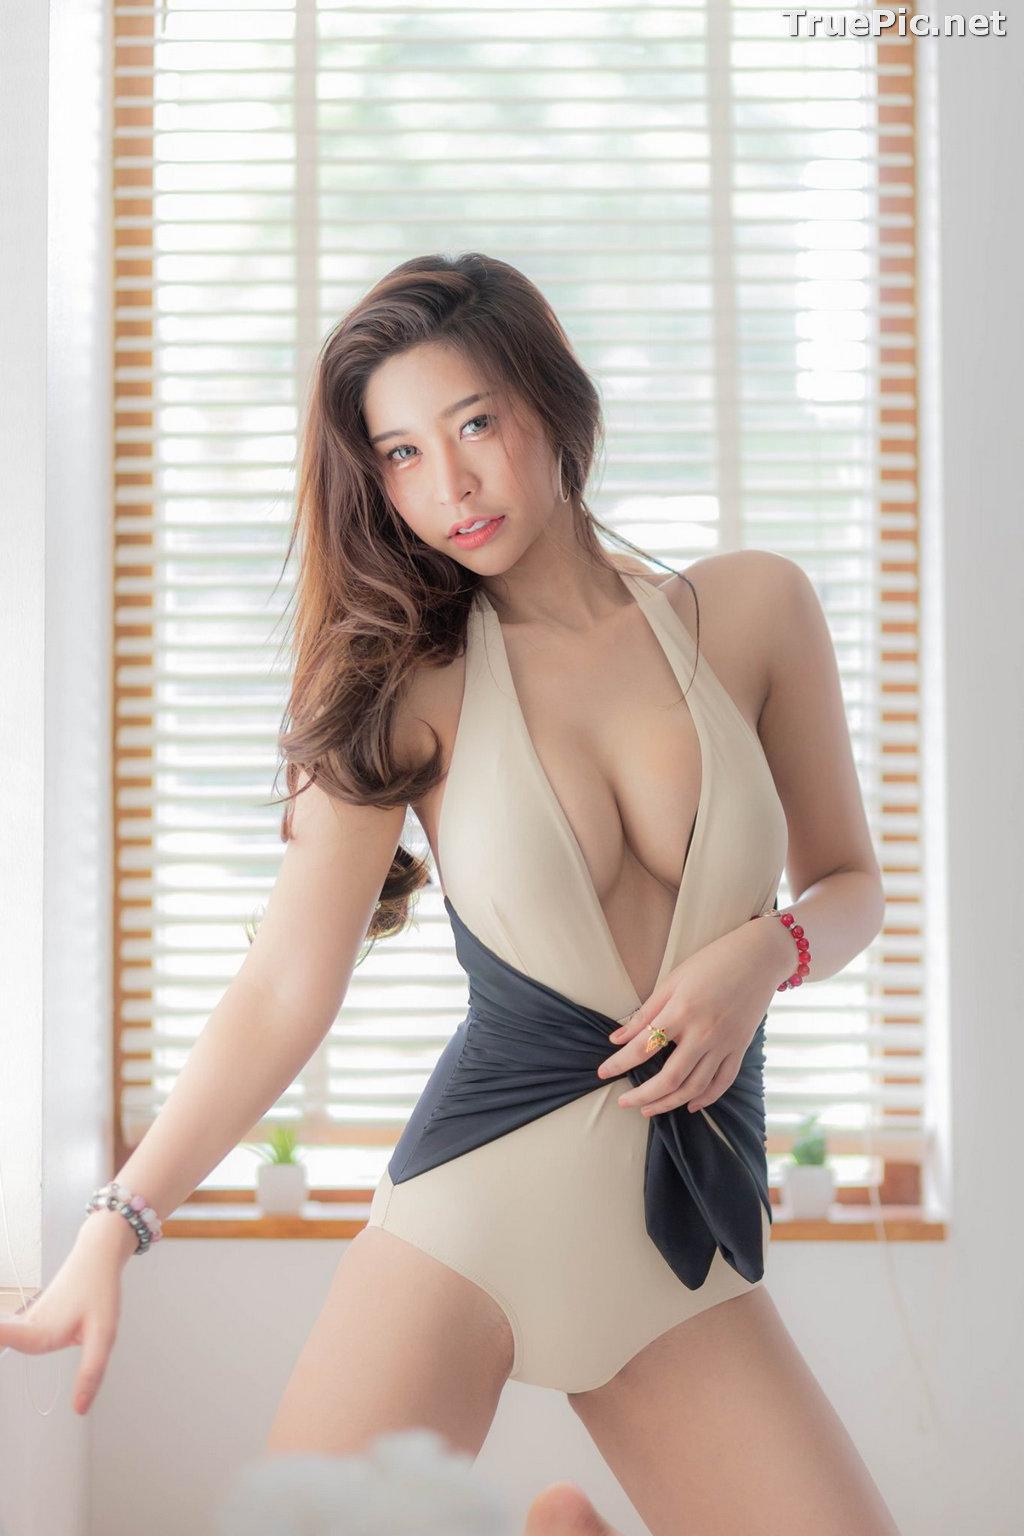 Image Thailand Model - Palm Palmvilai Raksapon - Let's Swimming With Me - TruePic.net - Picture-5